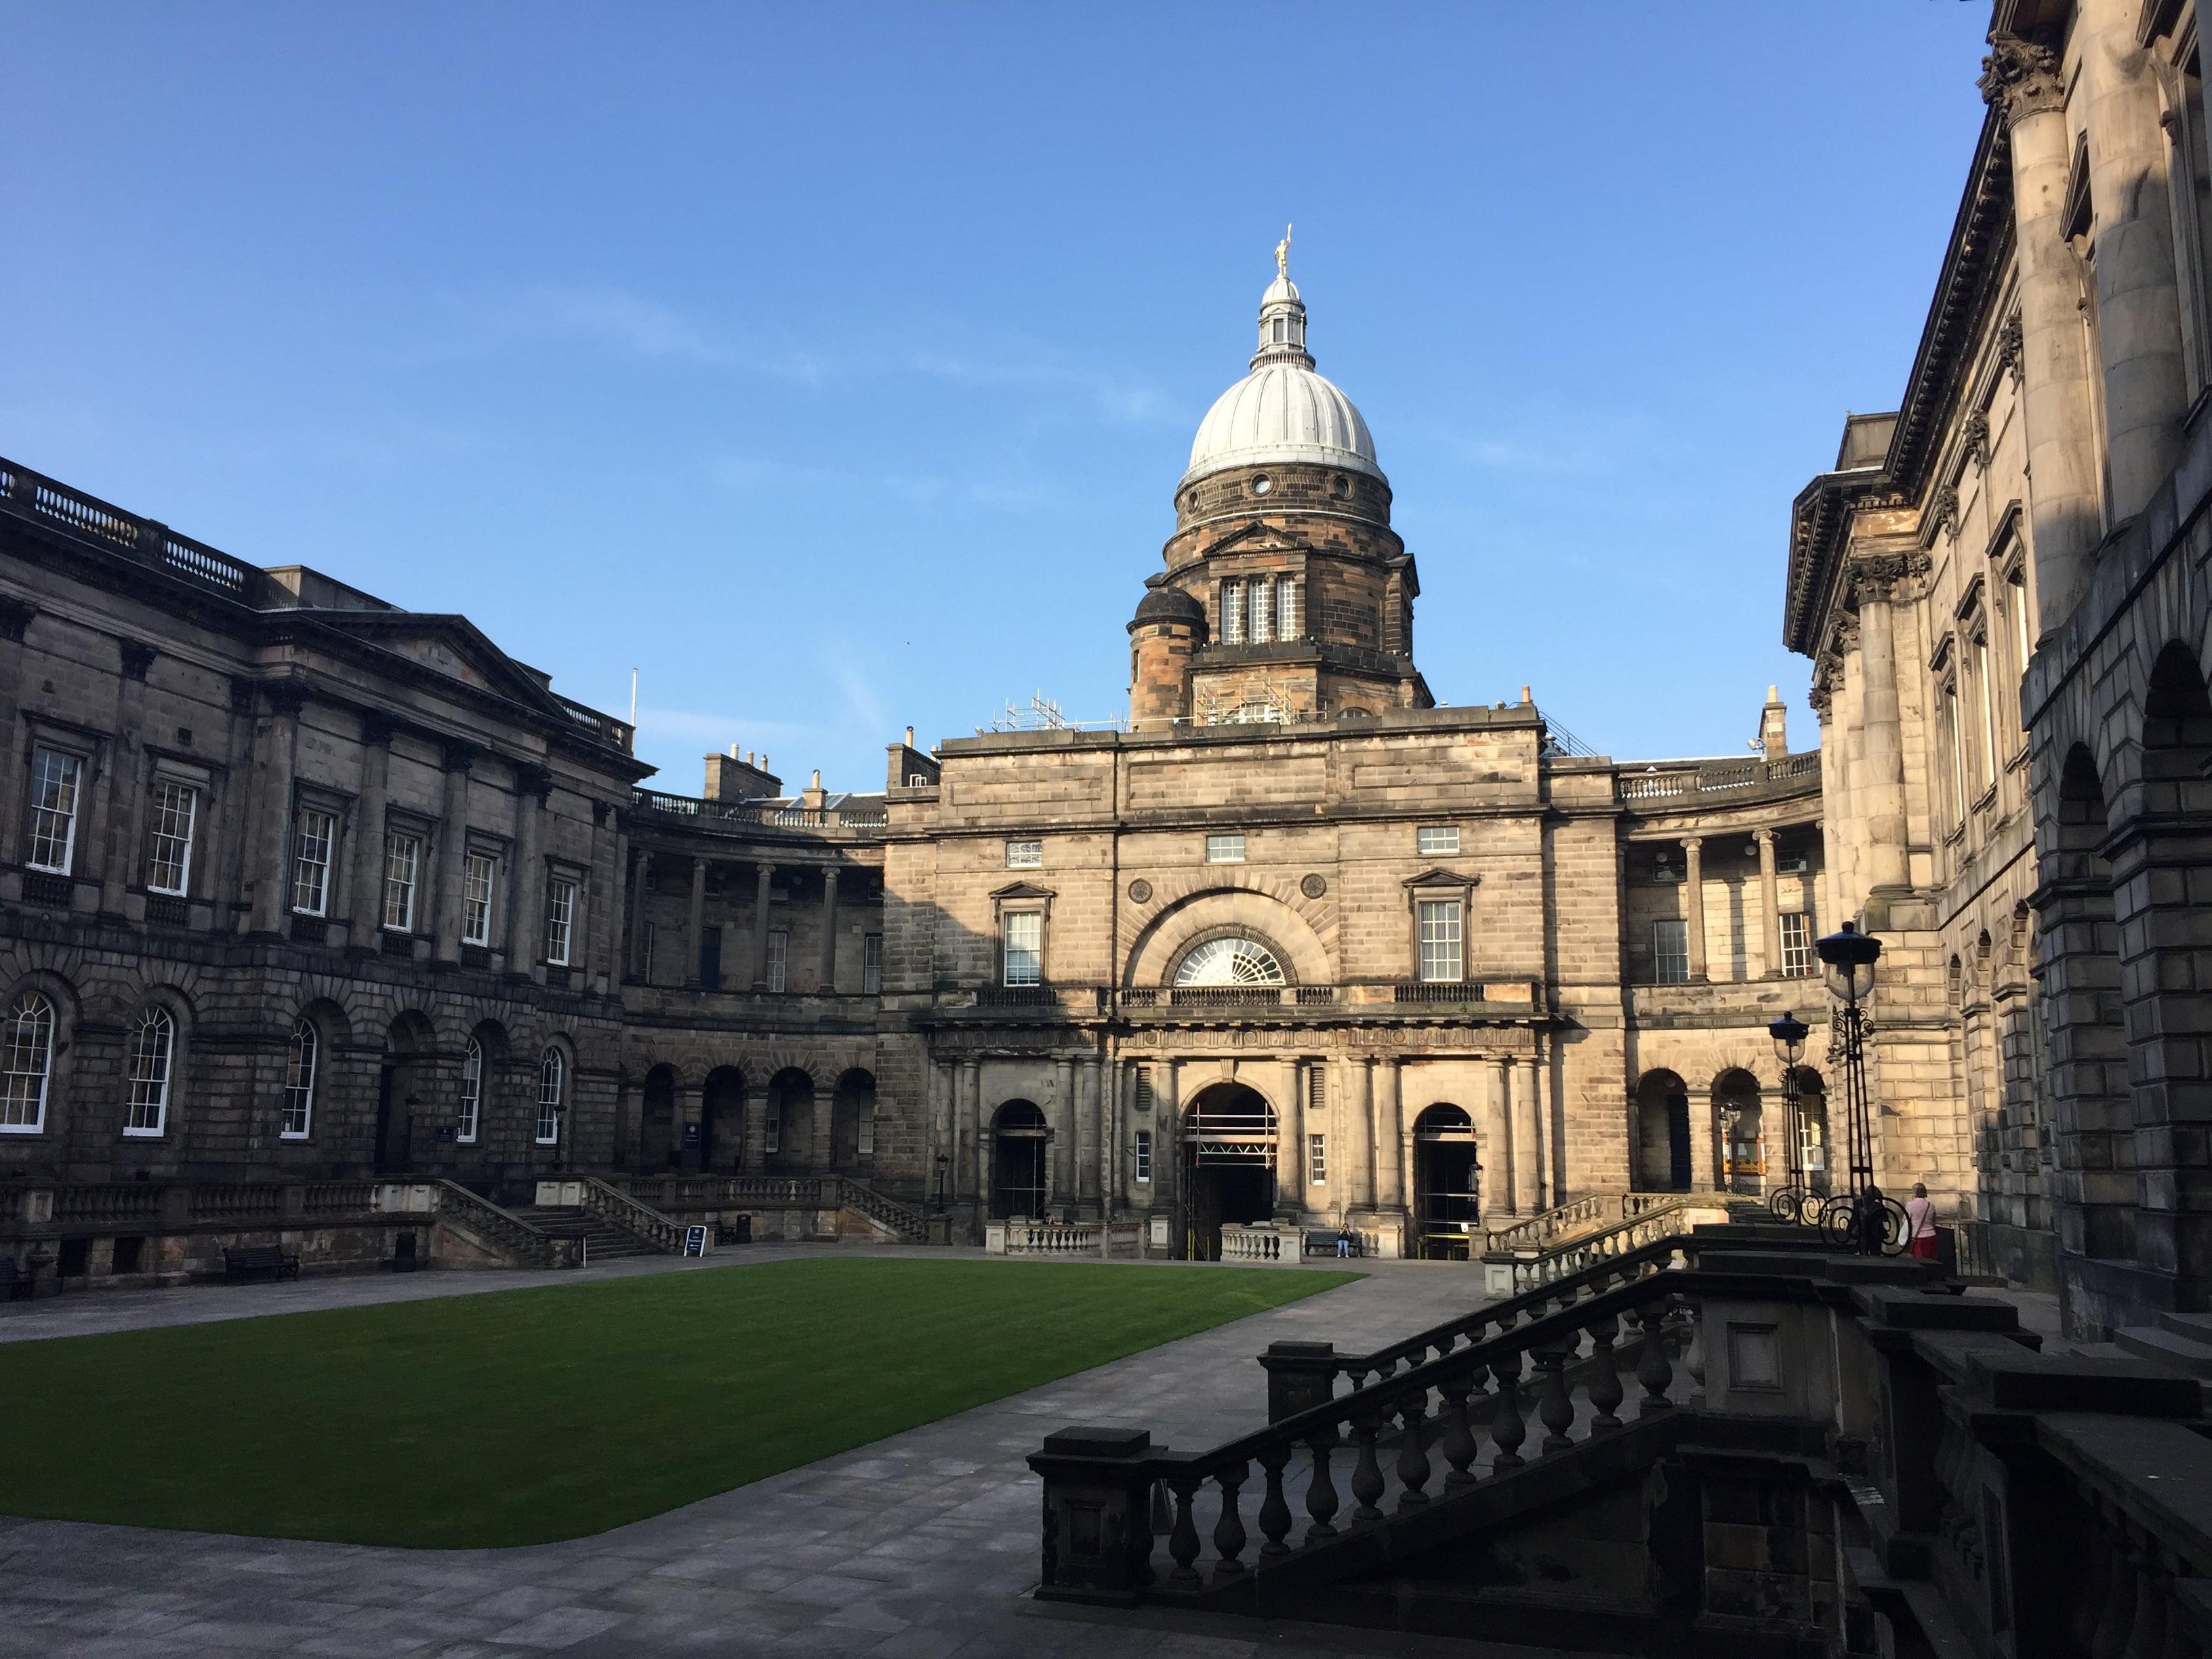 Massimo Sargiacomo - June 2016, Edinburgh: Accounting And Management Of Natural Disasters